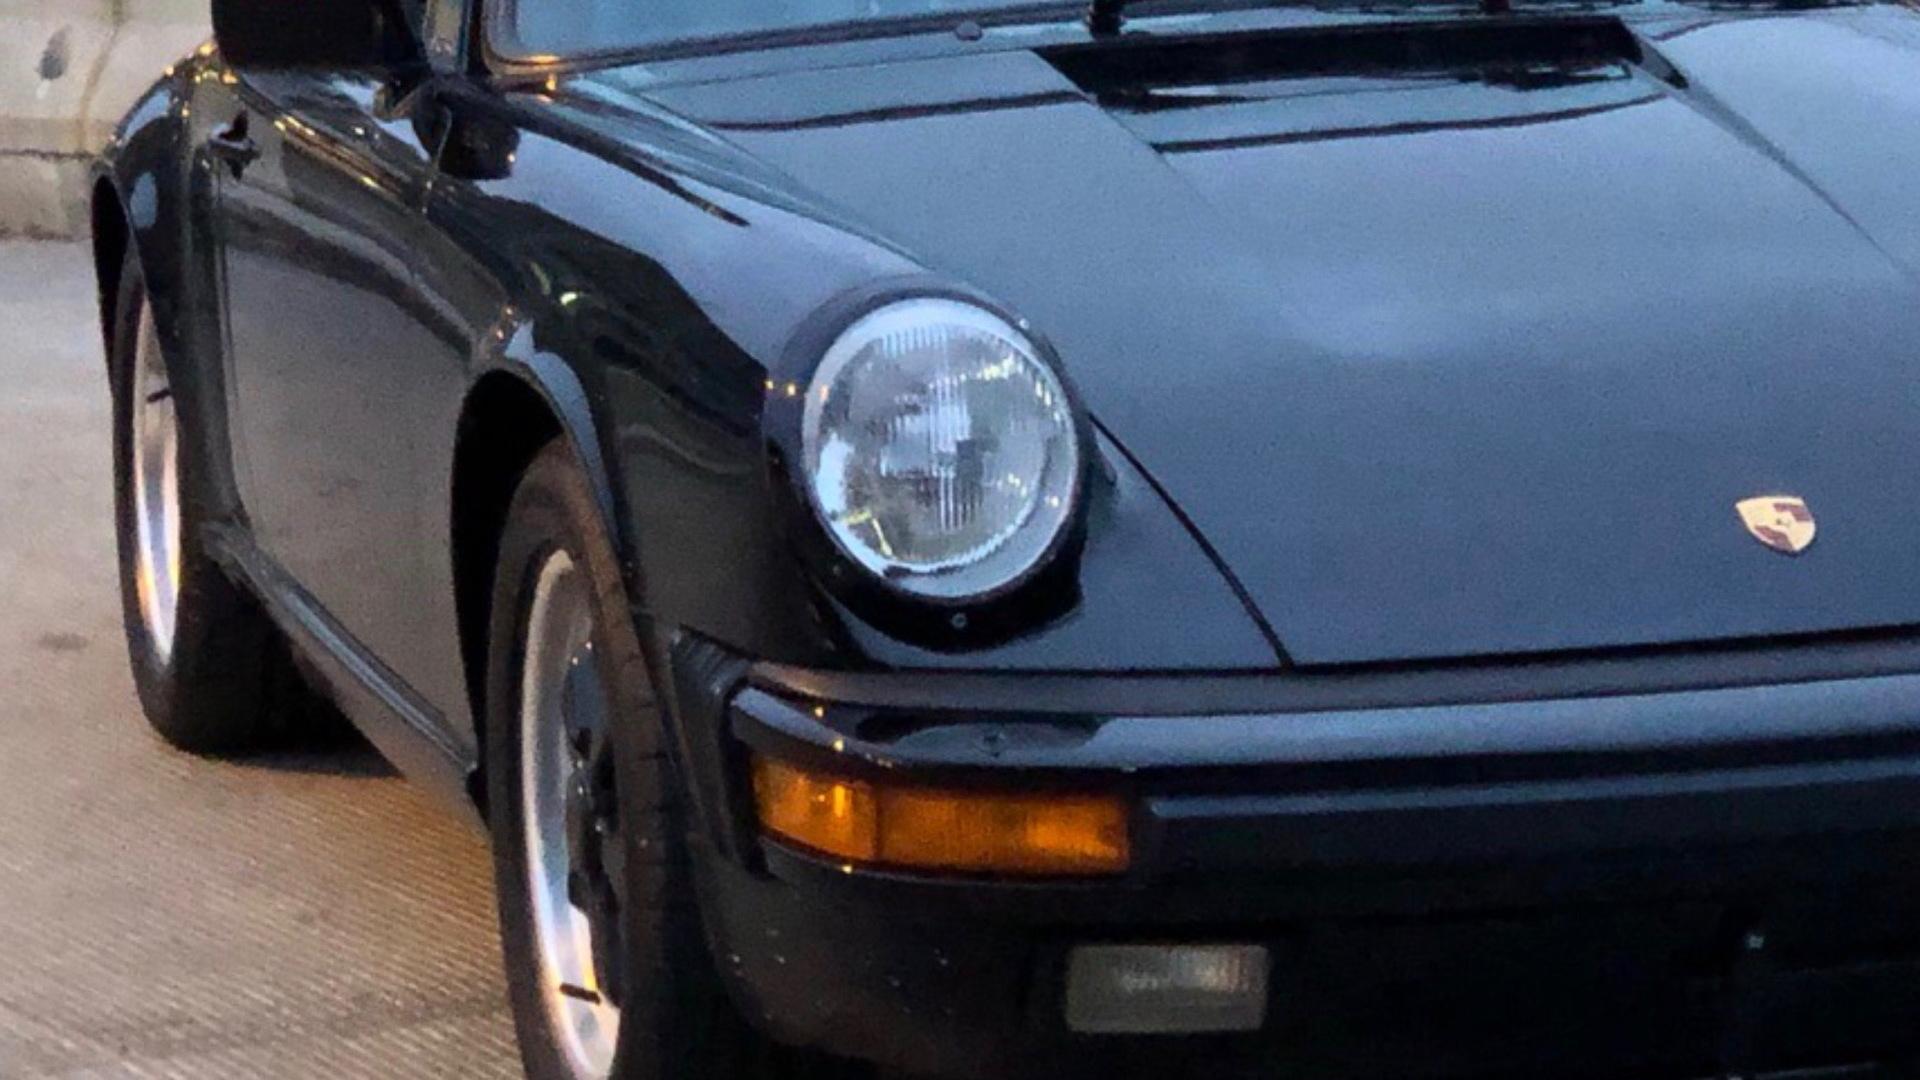 1986 Porsche 911 Carrera Targa owned by Tom Cruise (photo via Bring a Trailer)